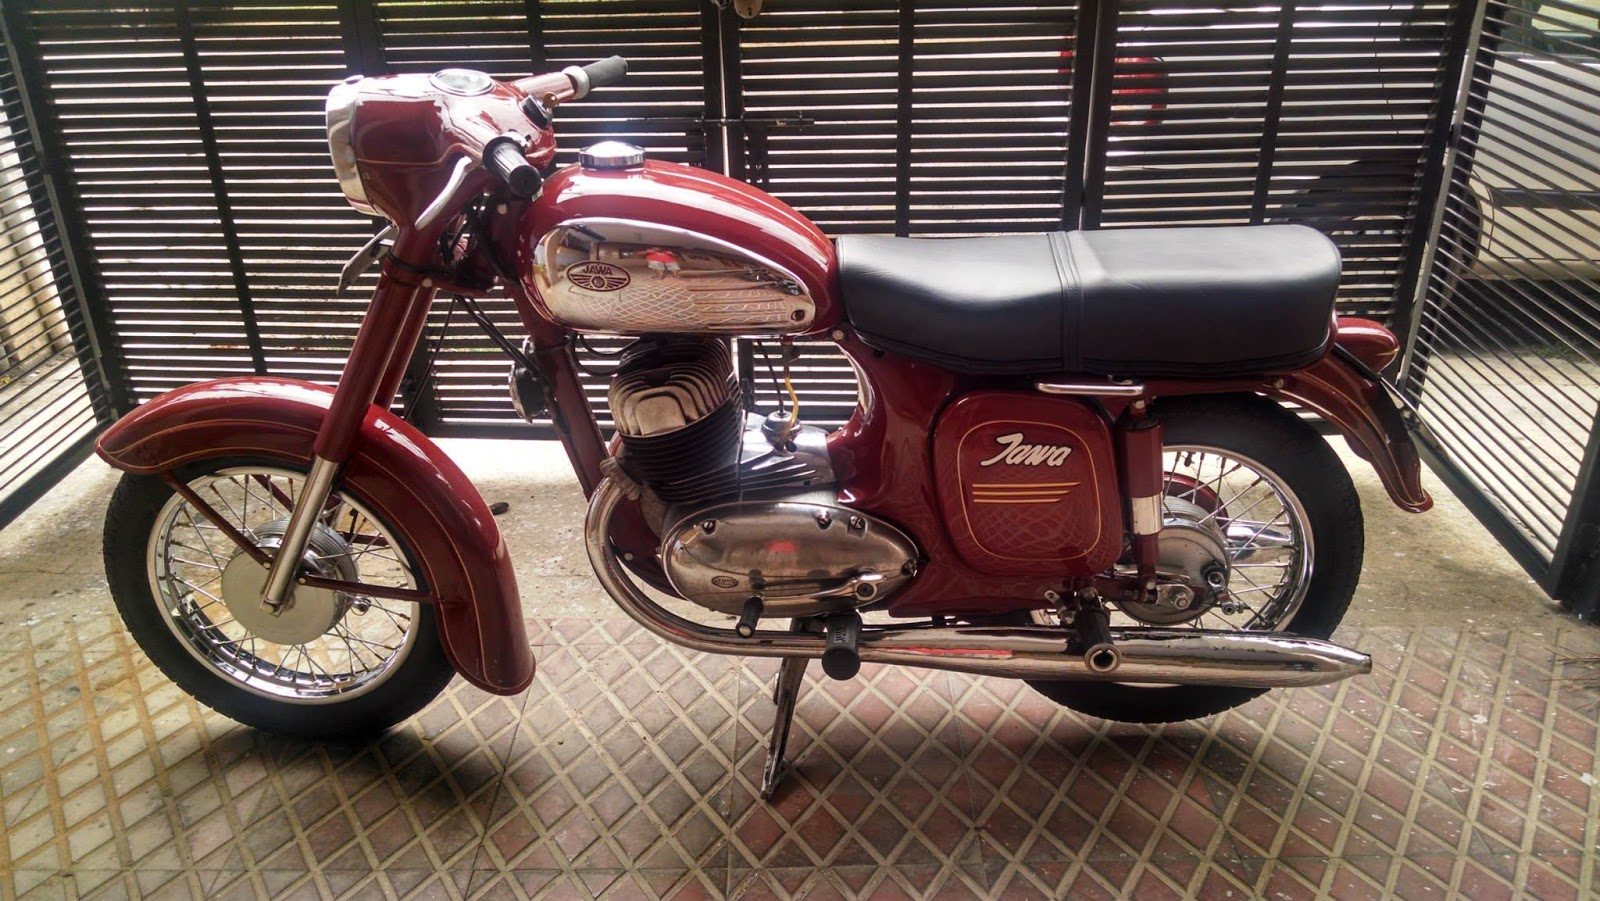 jawa motorcycle hd images  Bangalore Jawa Yezdi Motorcycle Club: Ideal Jawa - Forever Bike ...